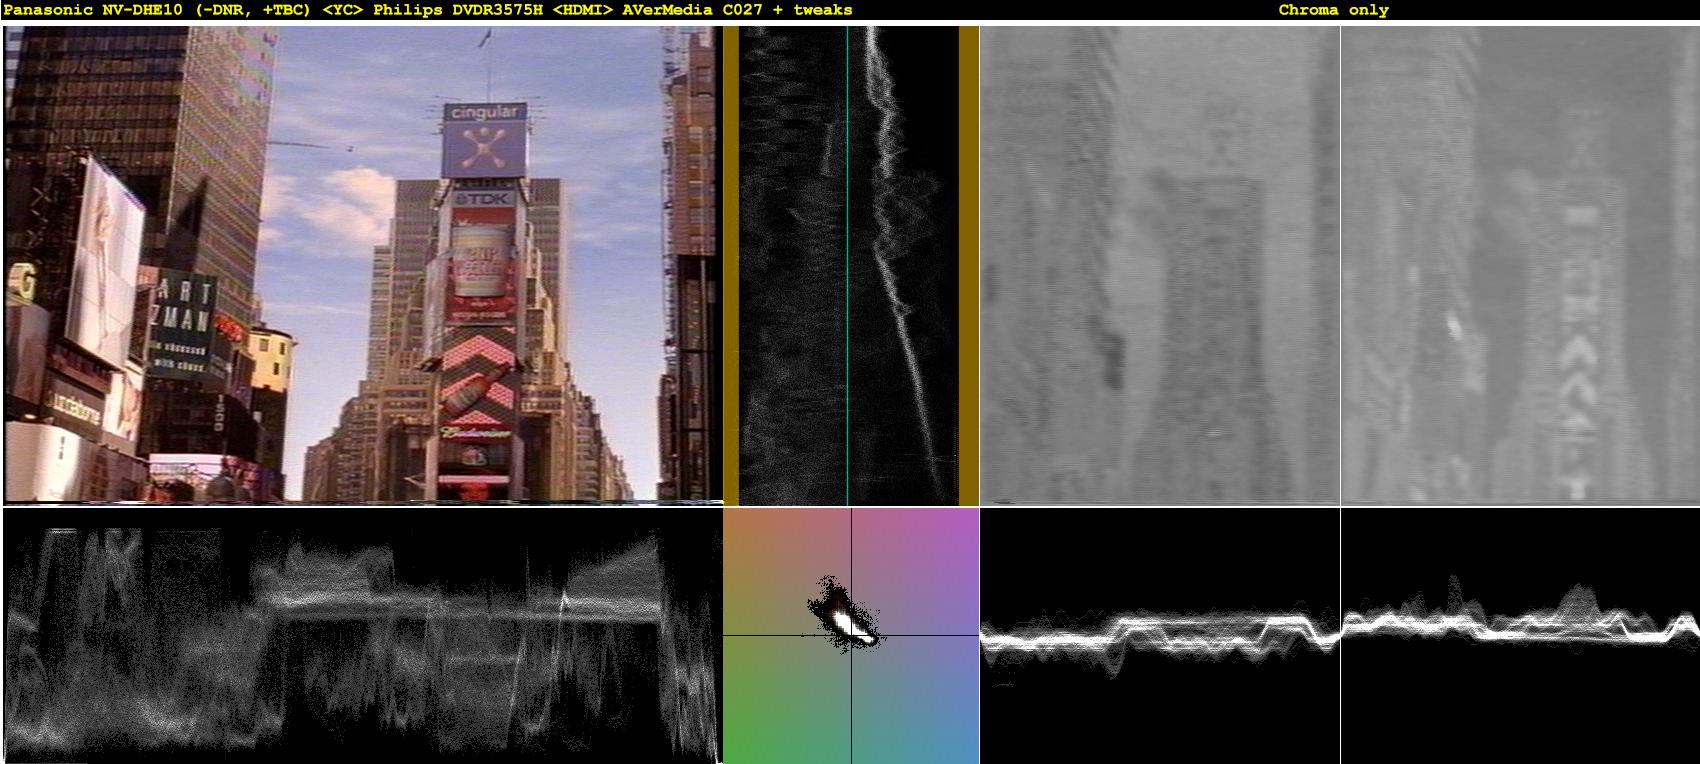 Click image for larger version  Name:1-14-17 - Panasonic NV-DHE10 (-DNR, +TBC).png Views:1218 Size:1.12 MB ID:37999